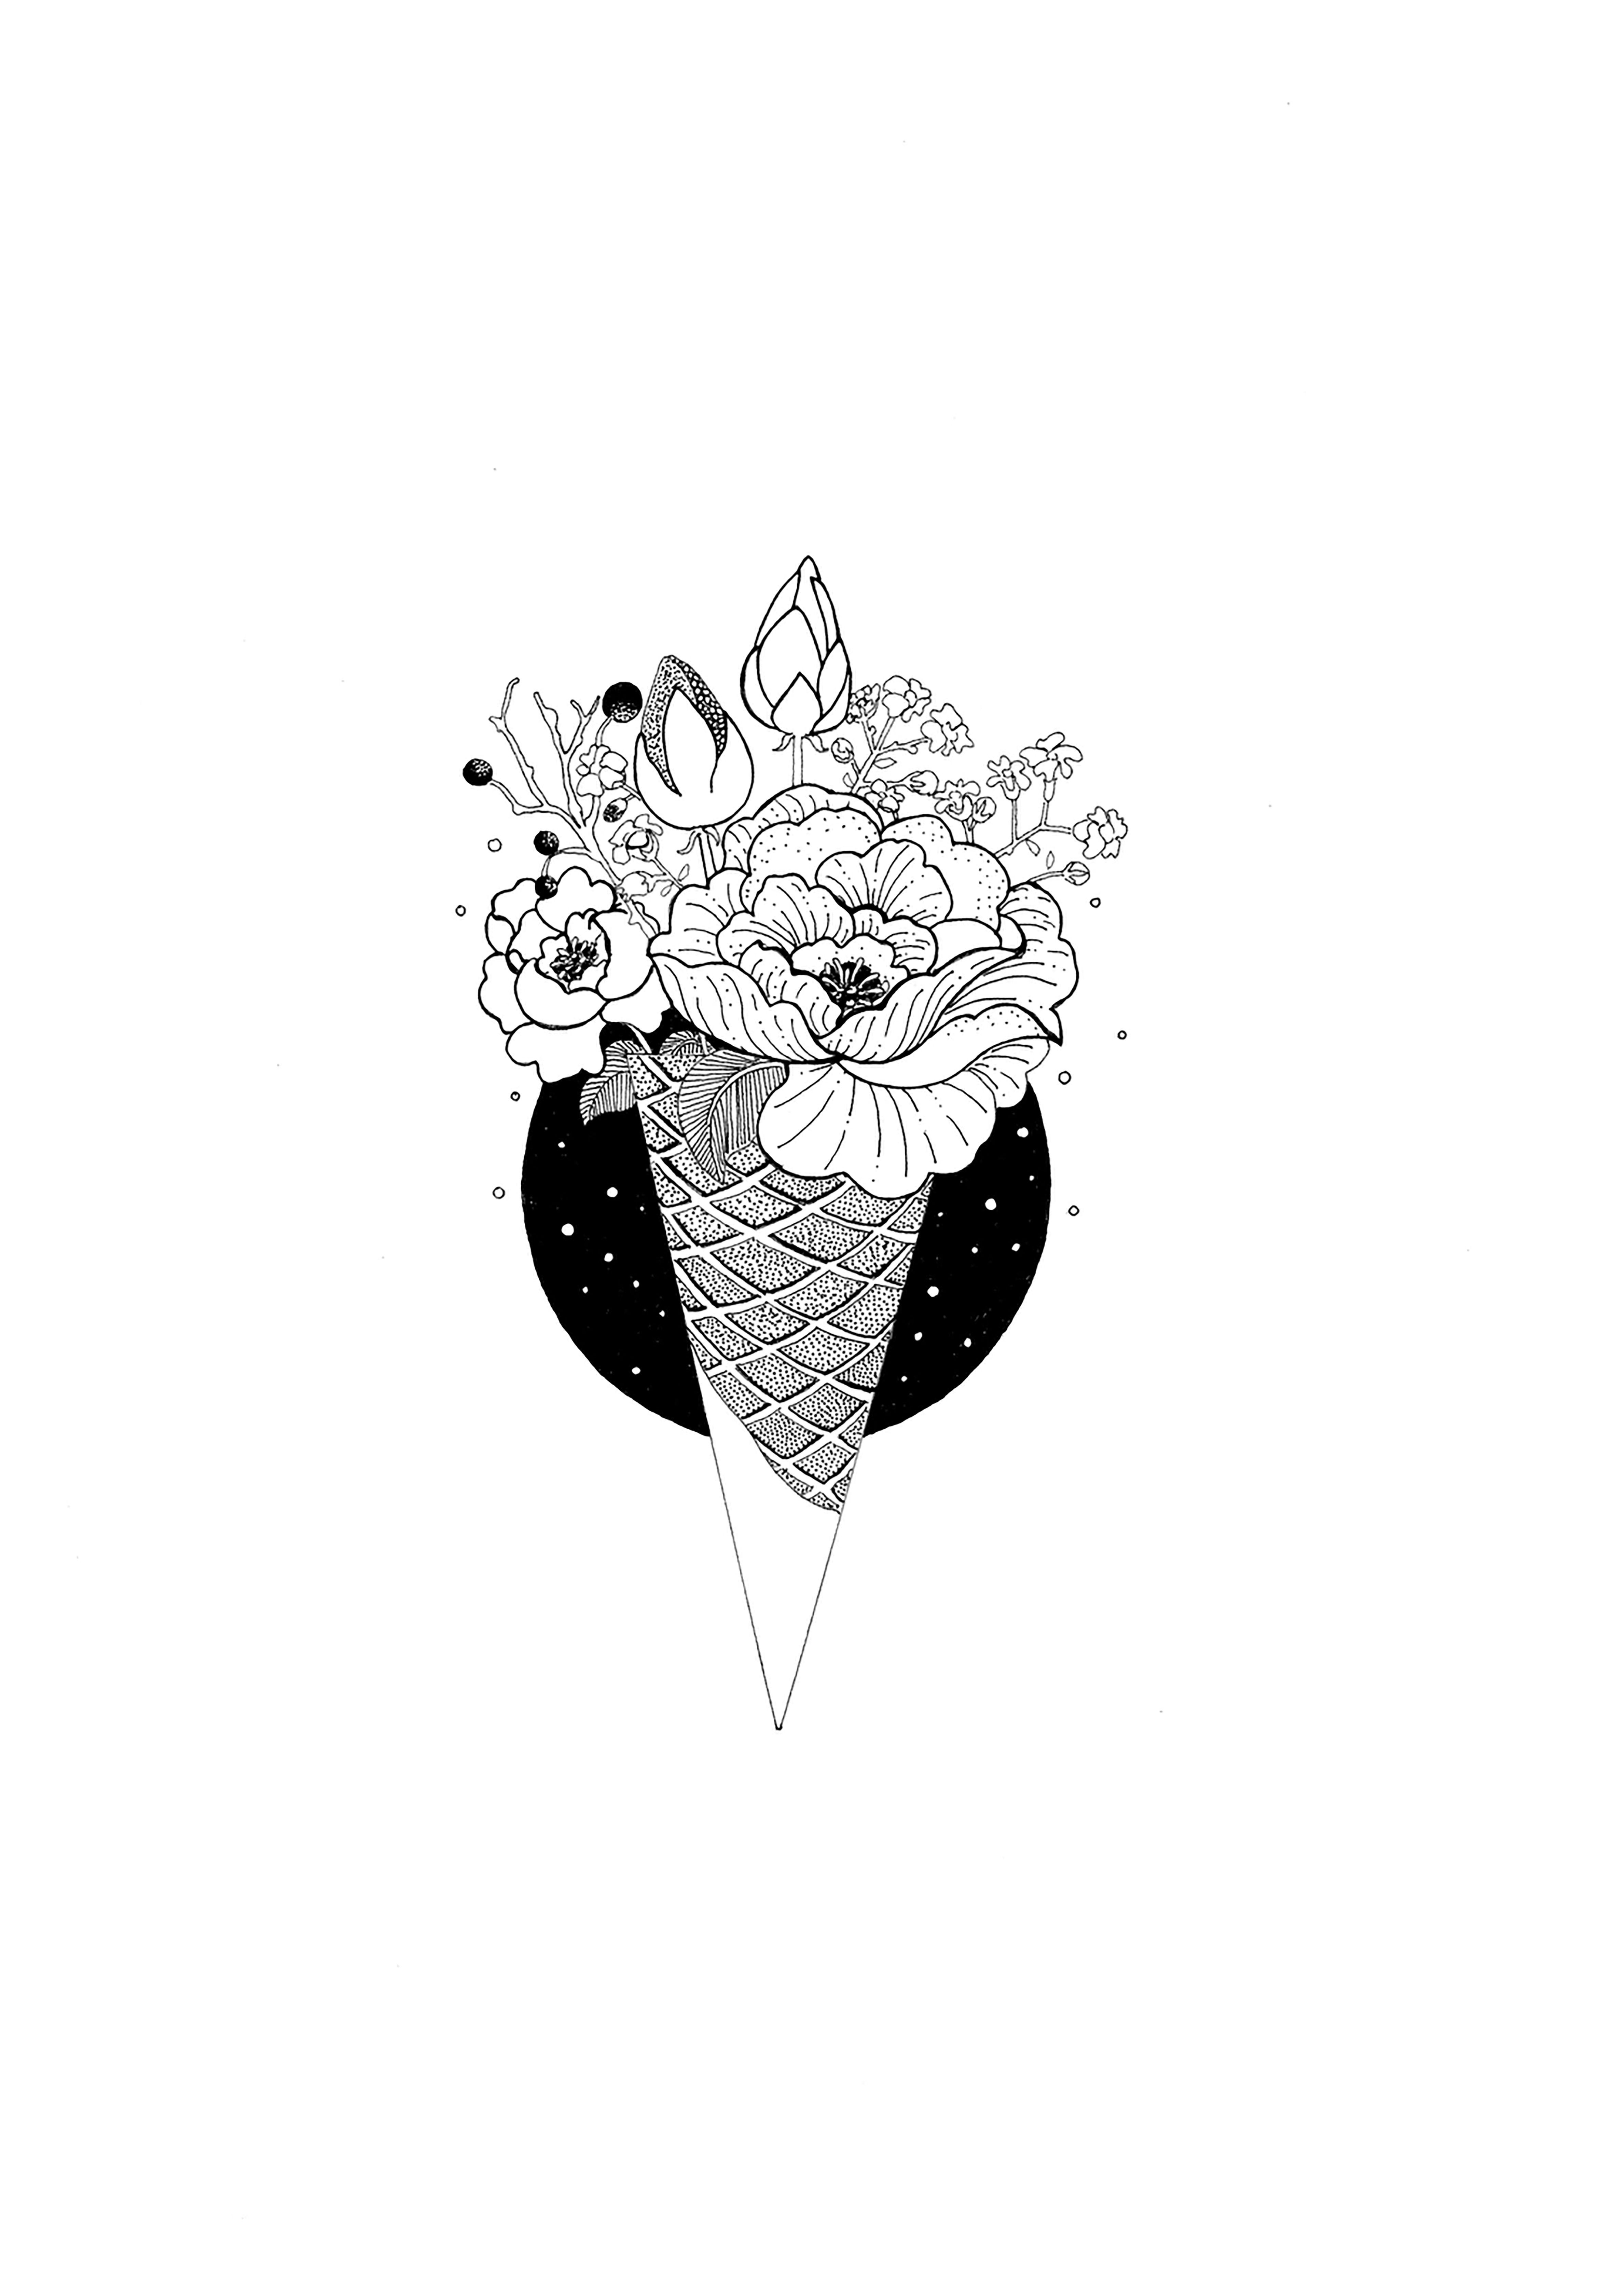 Cone Flowers Emotional Art Flower Drawing Pen Art